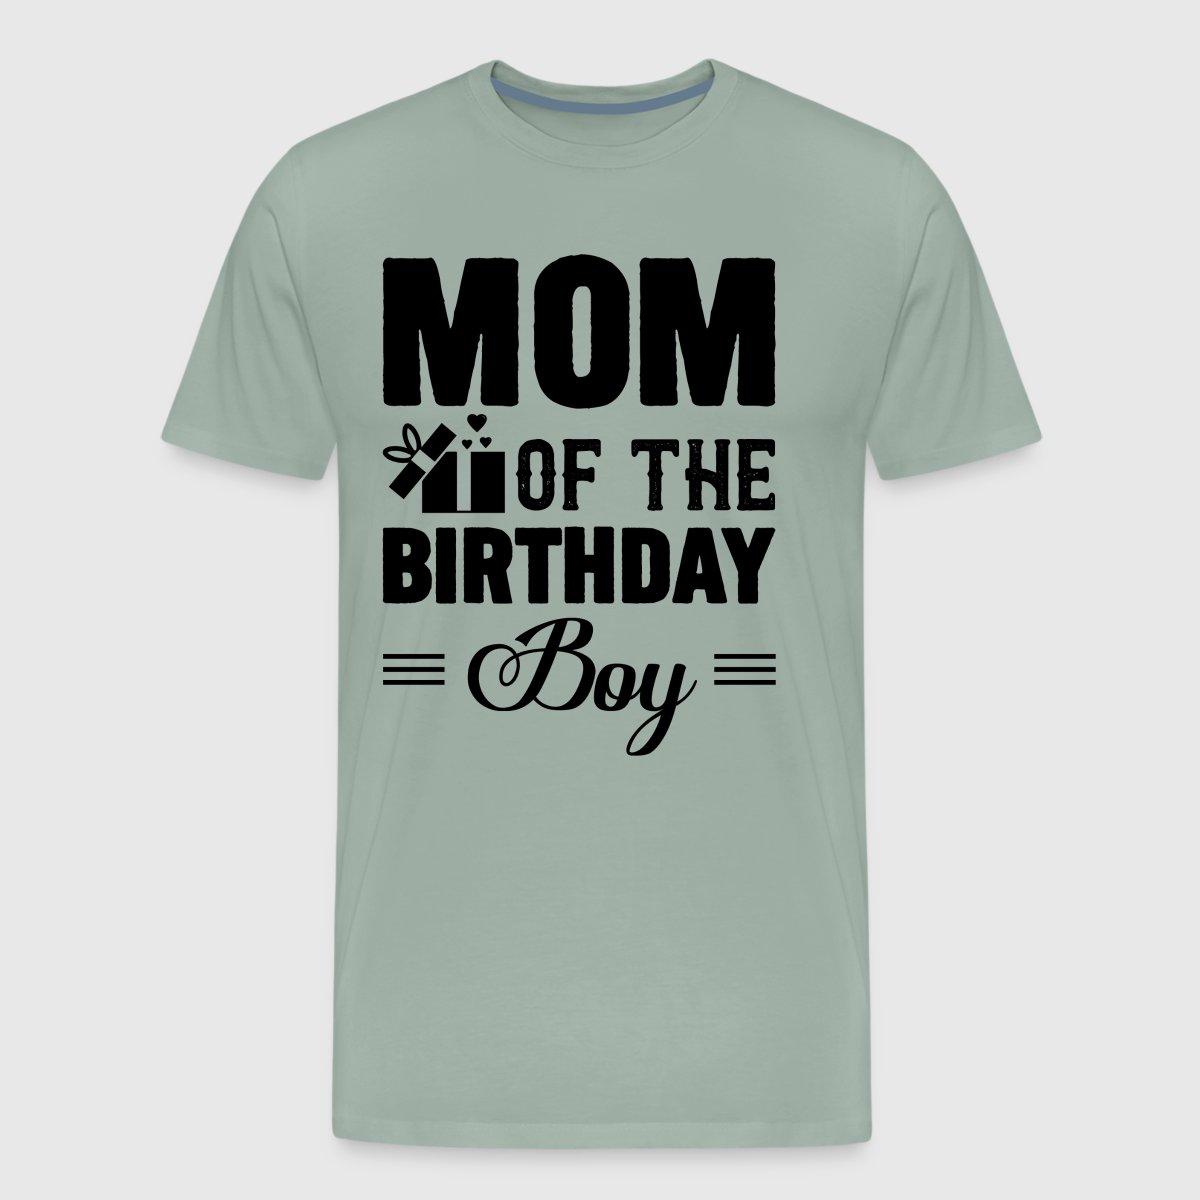 Mom And Dad Of Birthday Boy Shirts